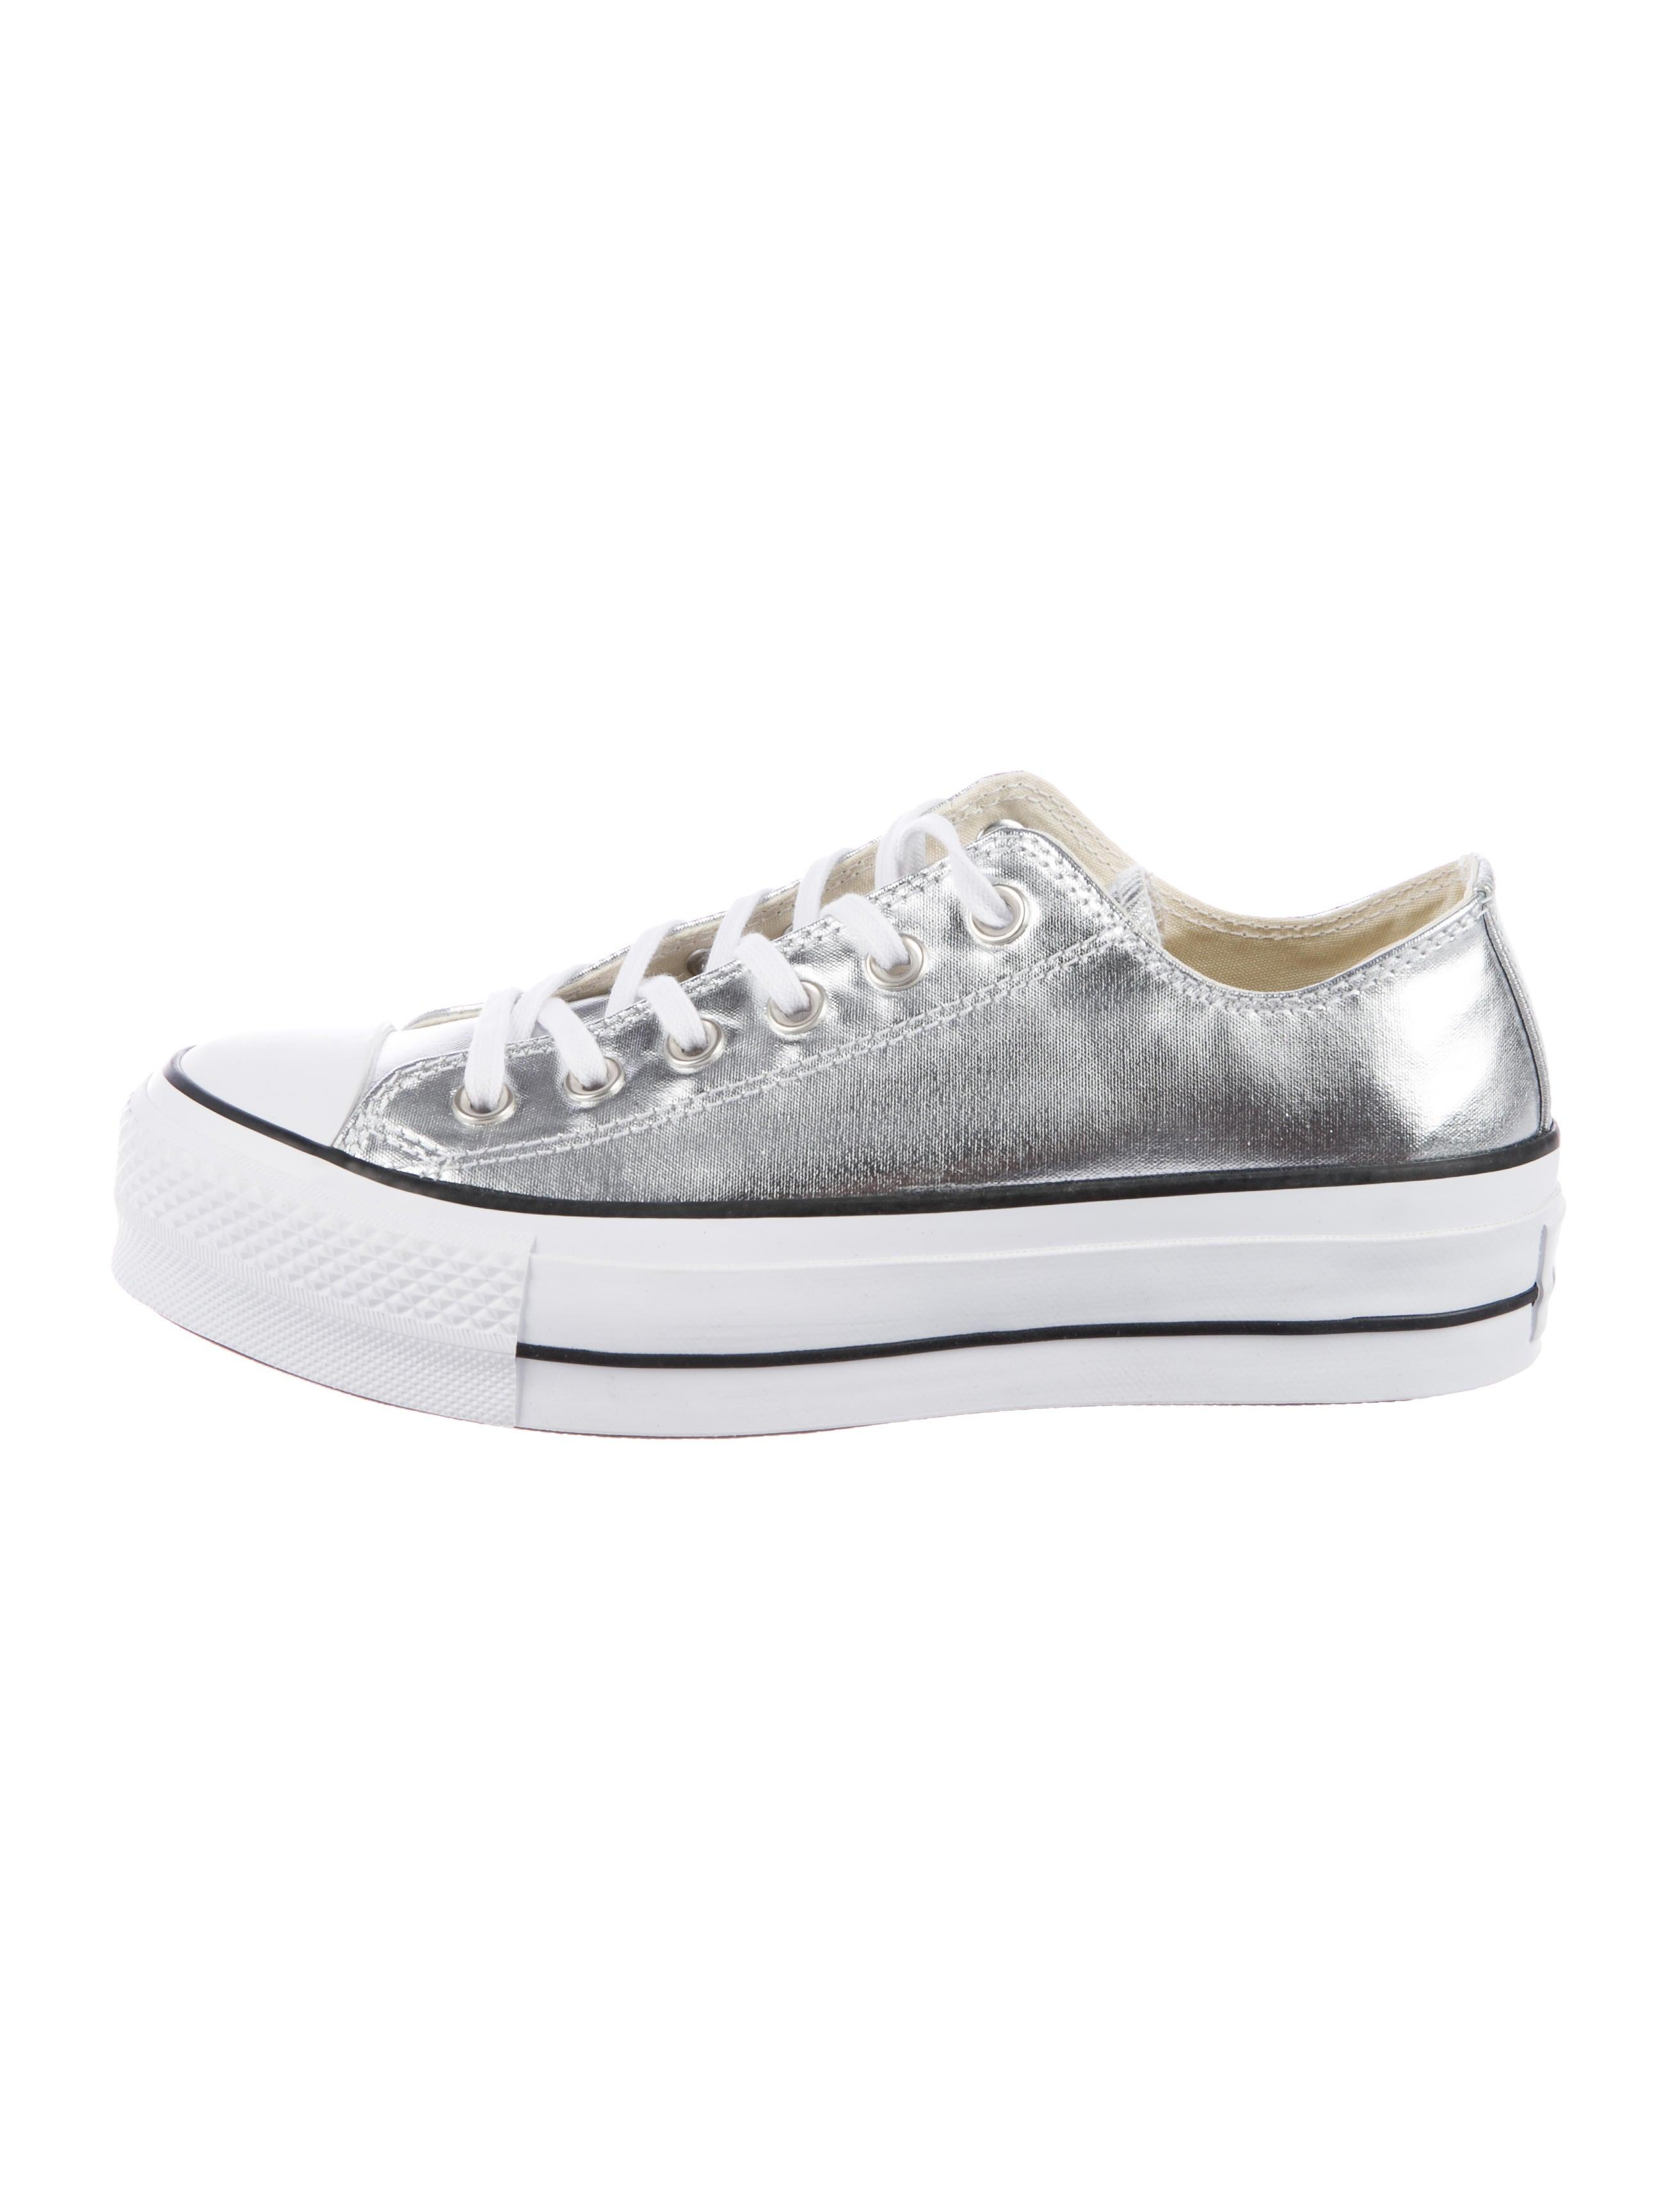 Converse Metallic Platform Sneakers w/ Tags 2015 online Vs2MlqYw0v